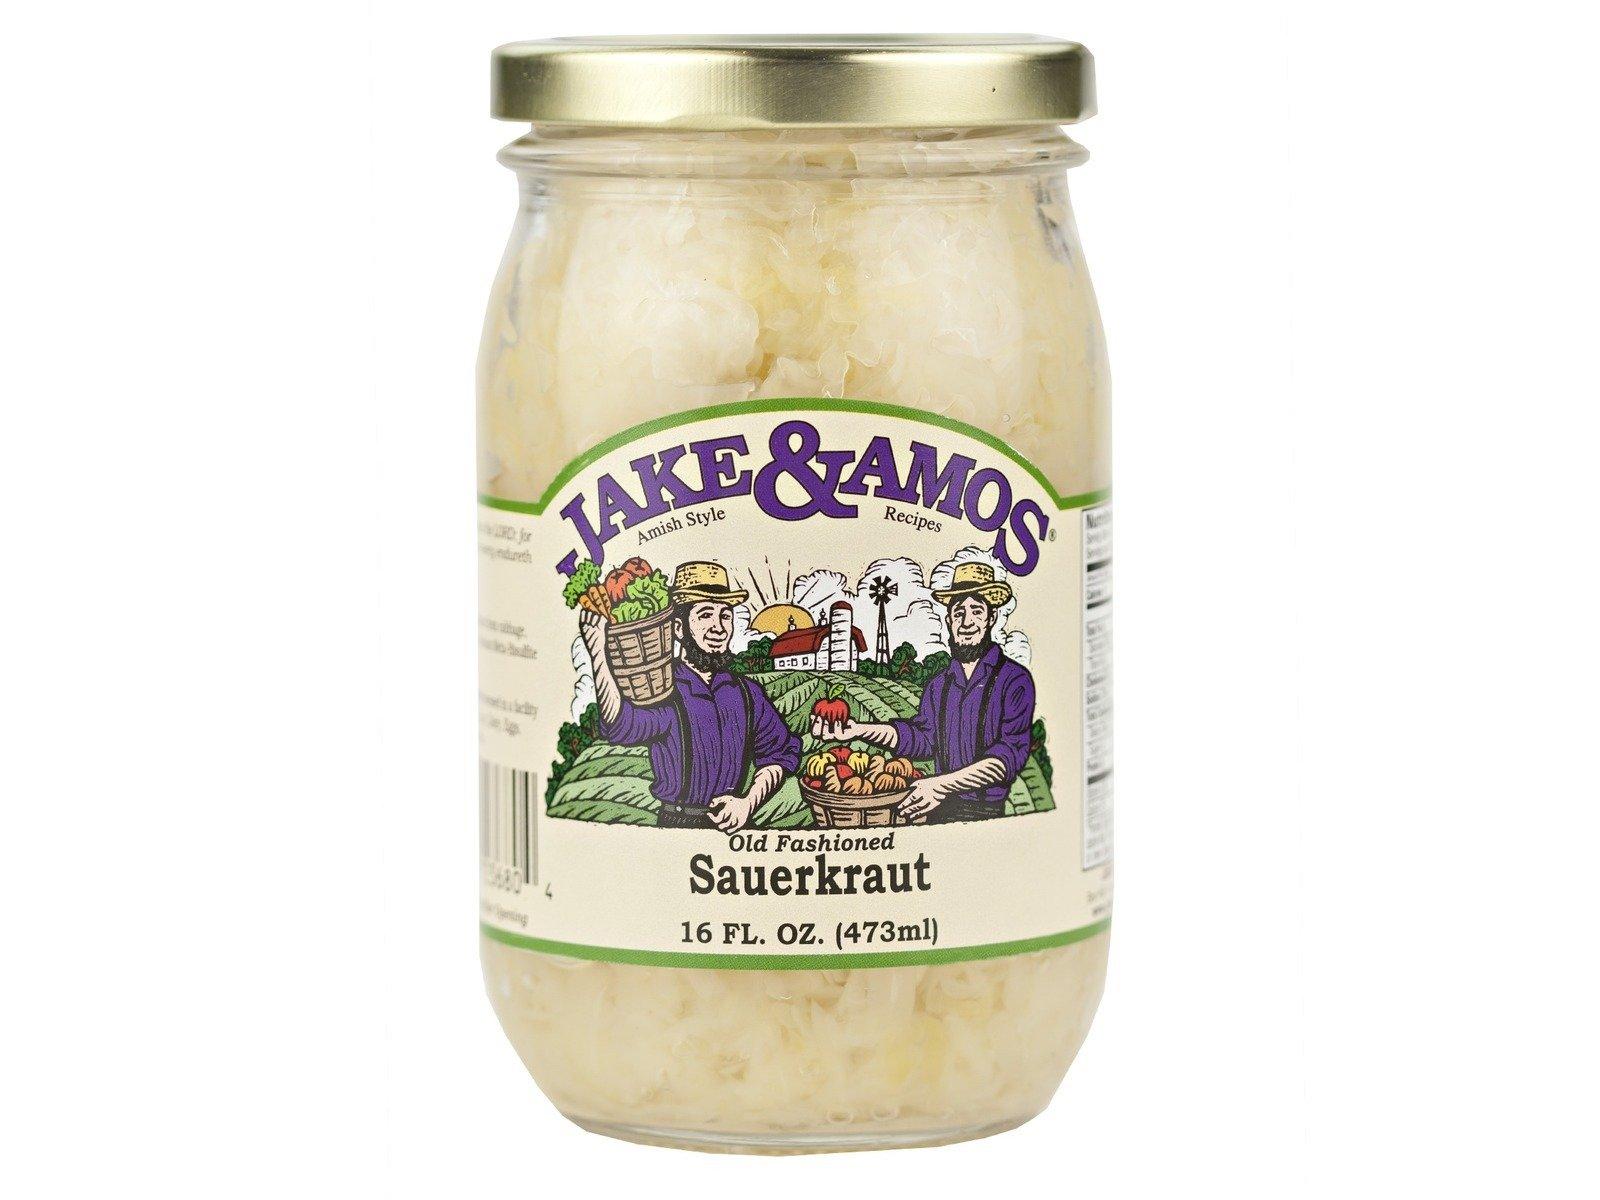 Sauerkraut 3 jars: Jake and Amos